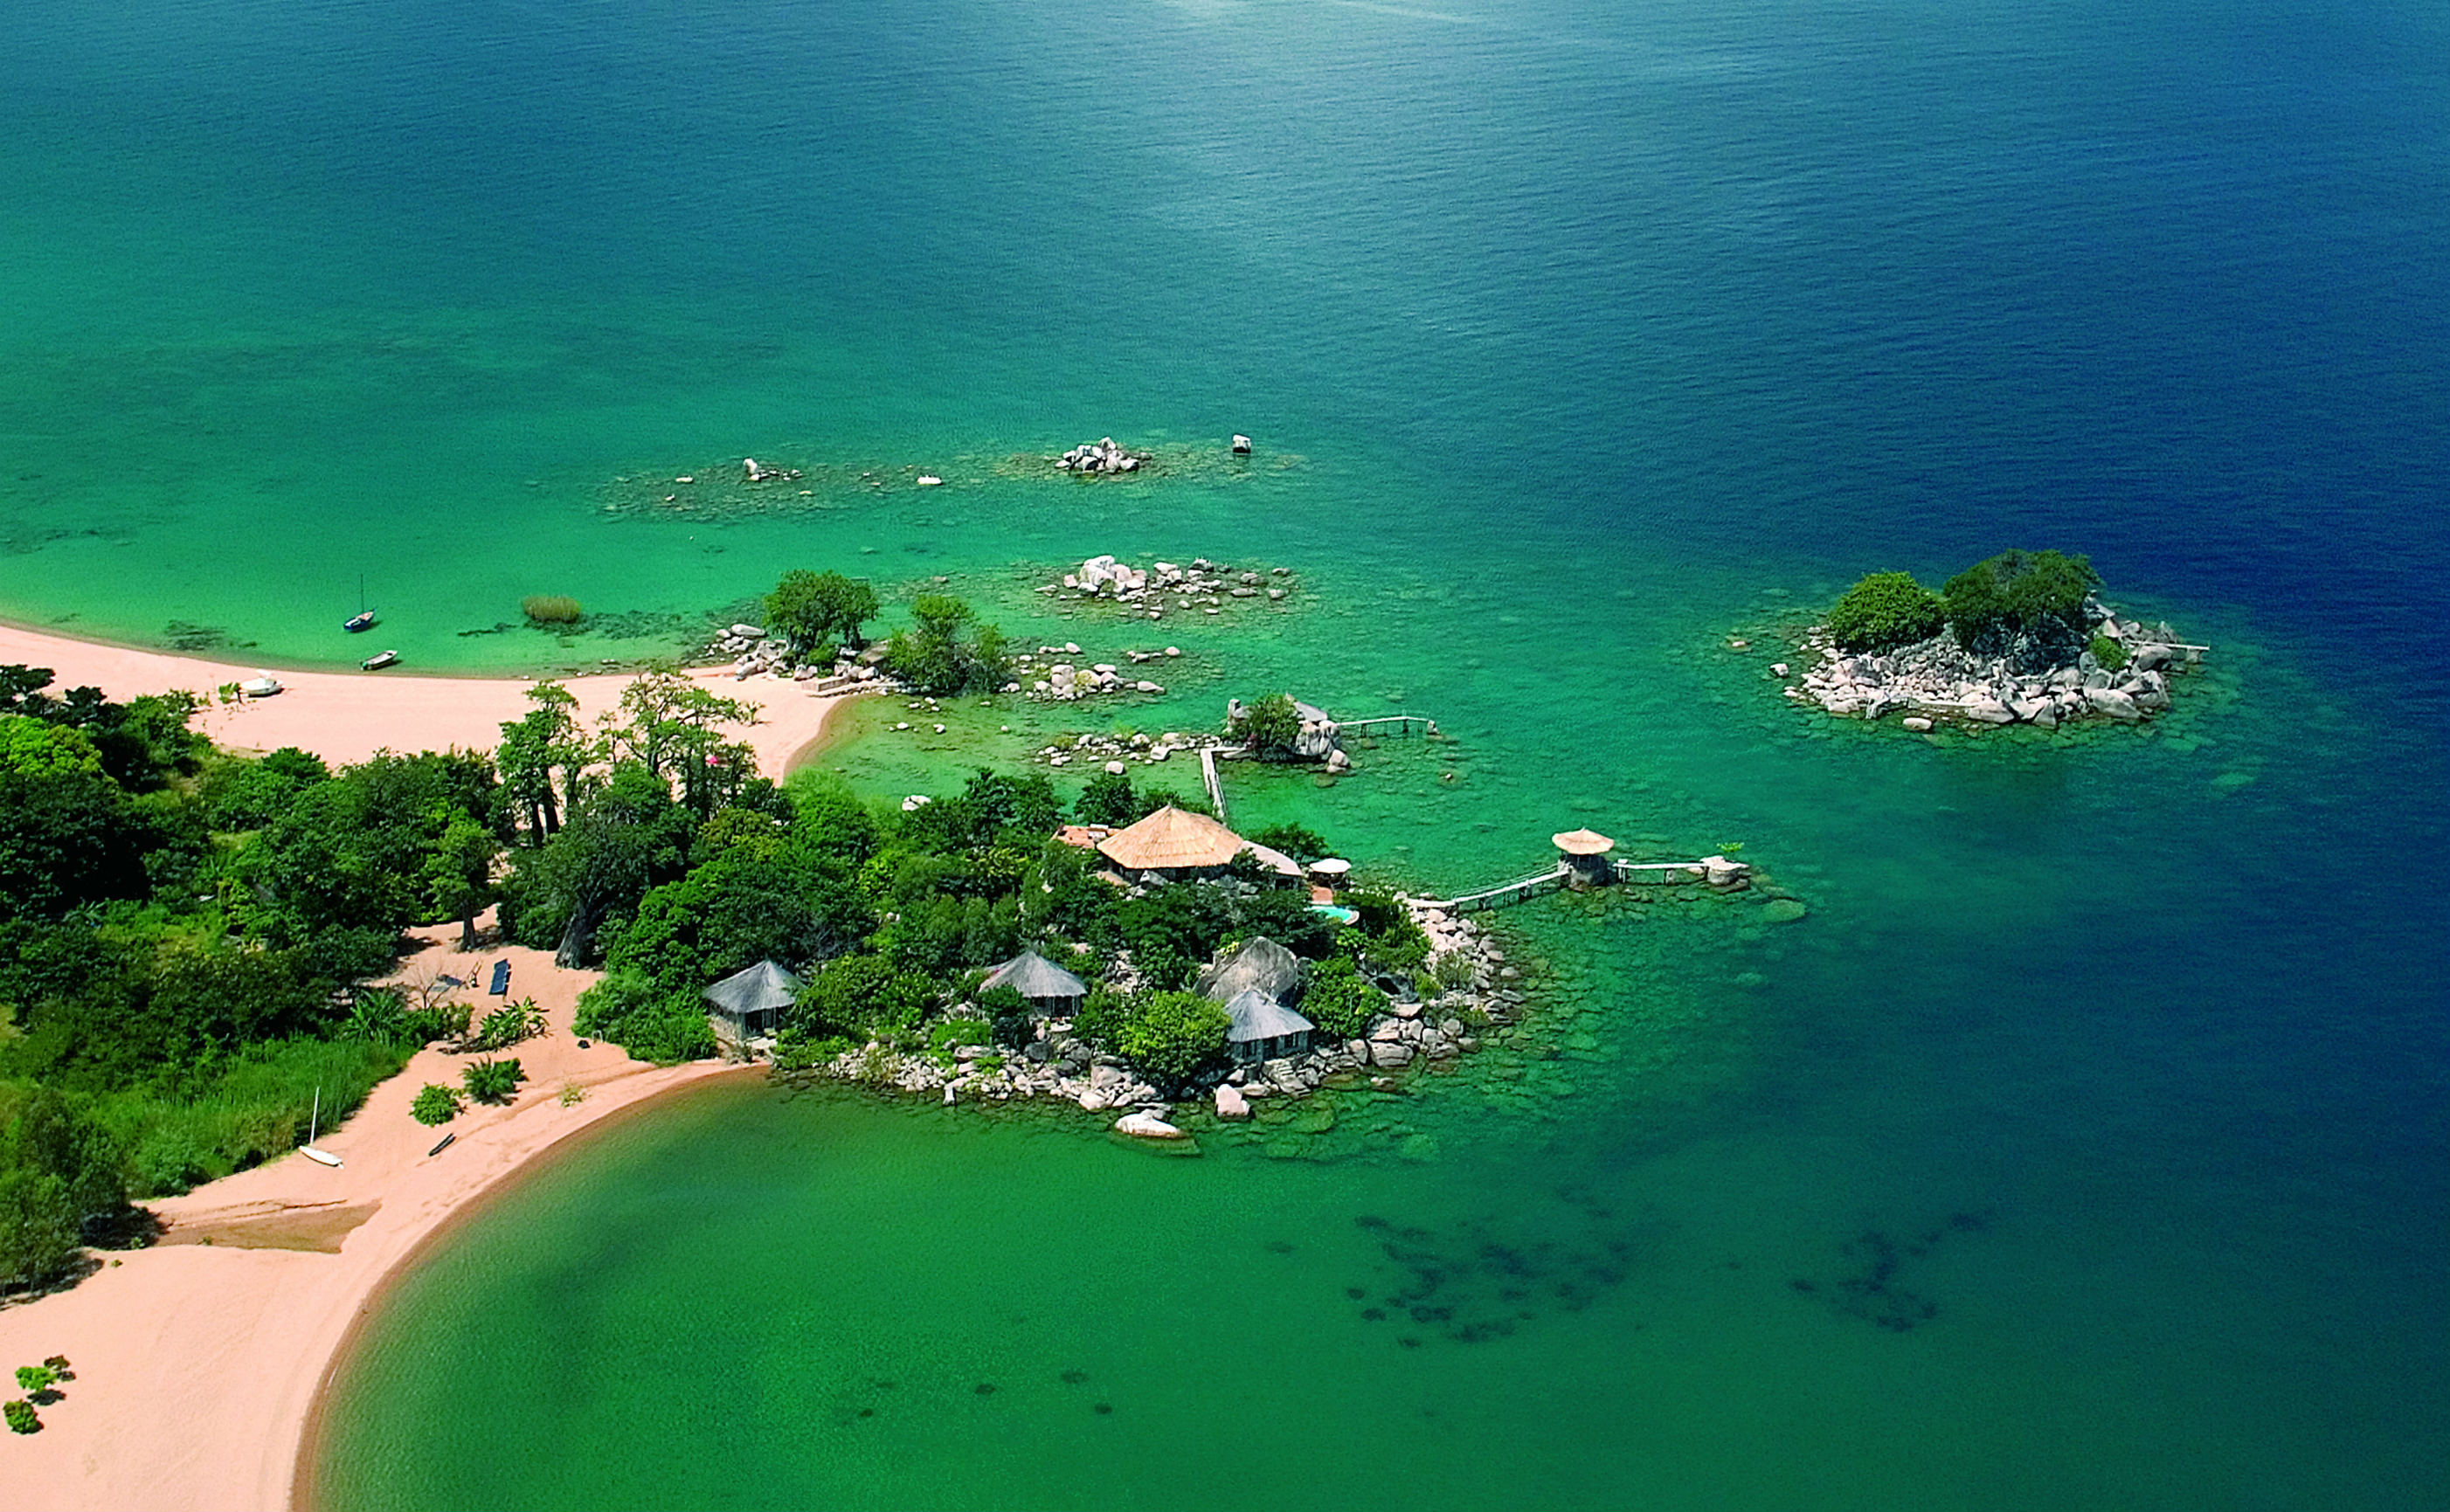 Lago Malawi - Kaya Mawa